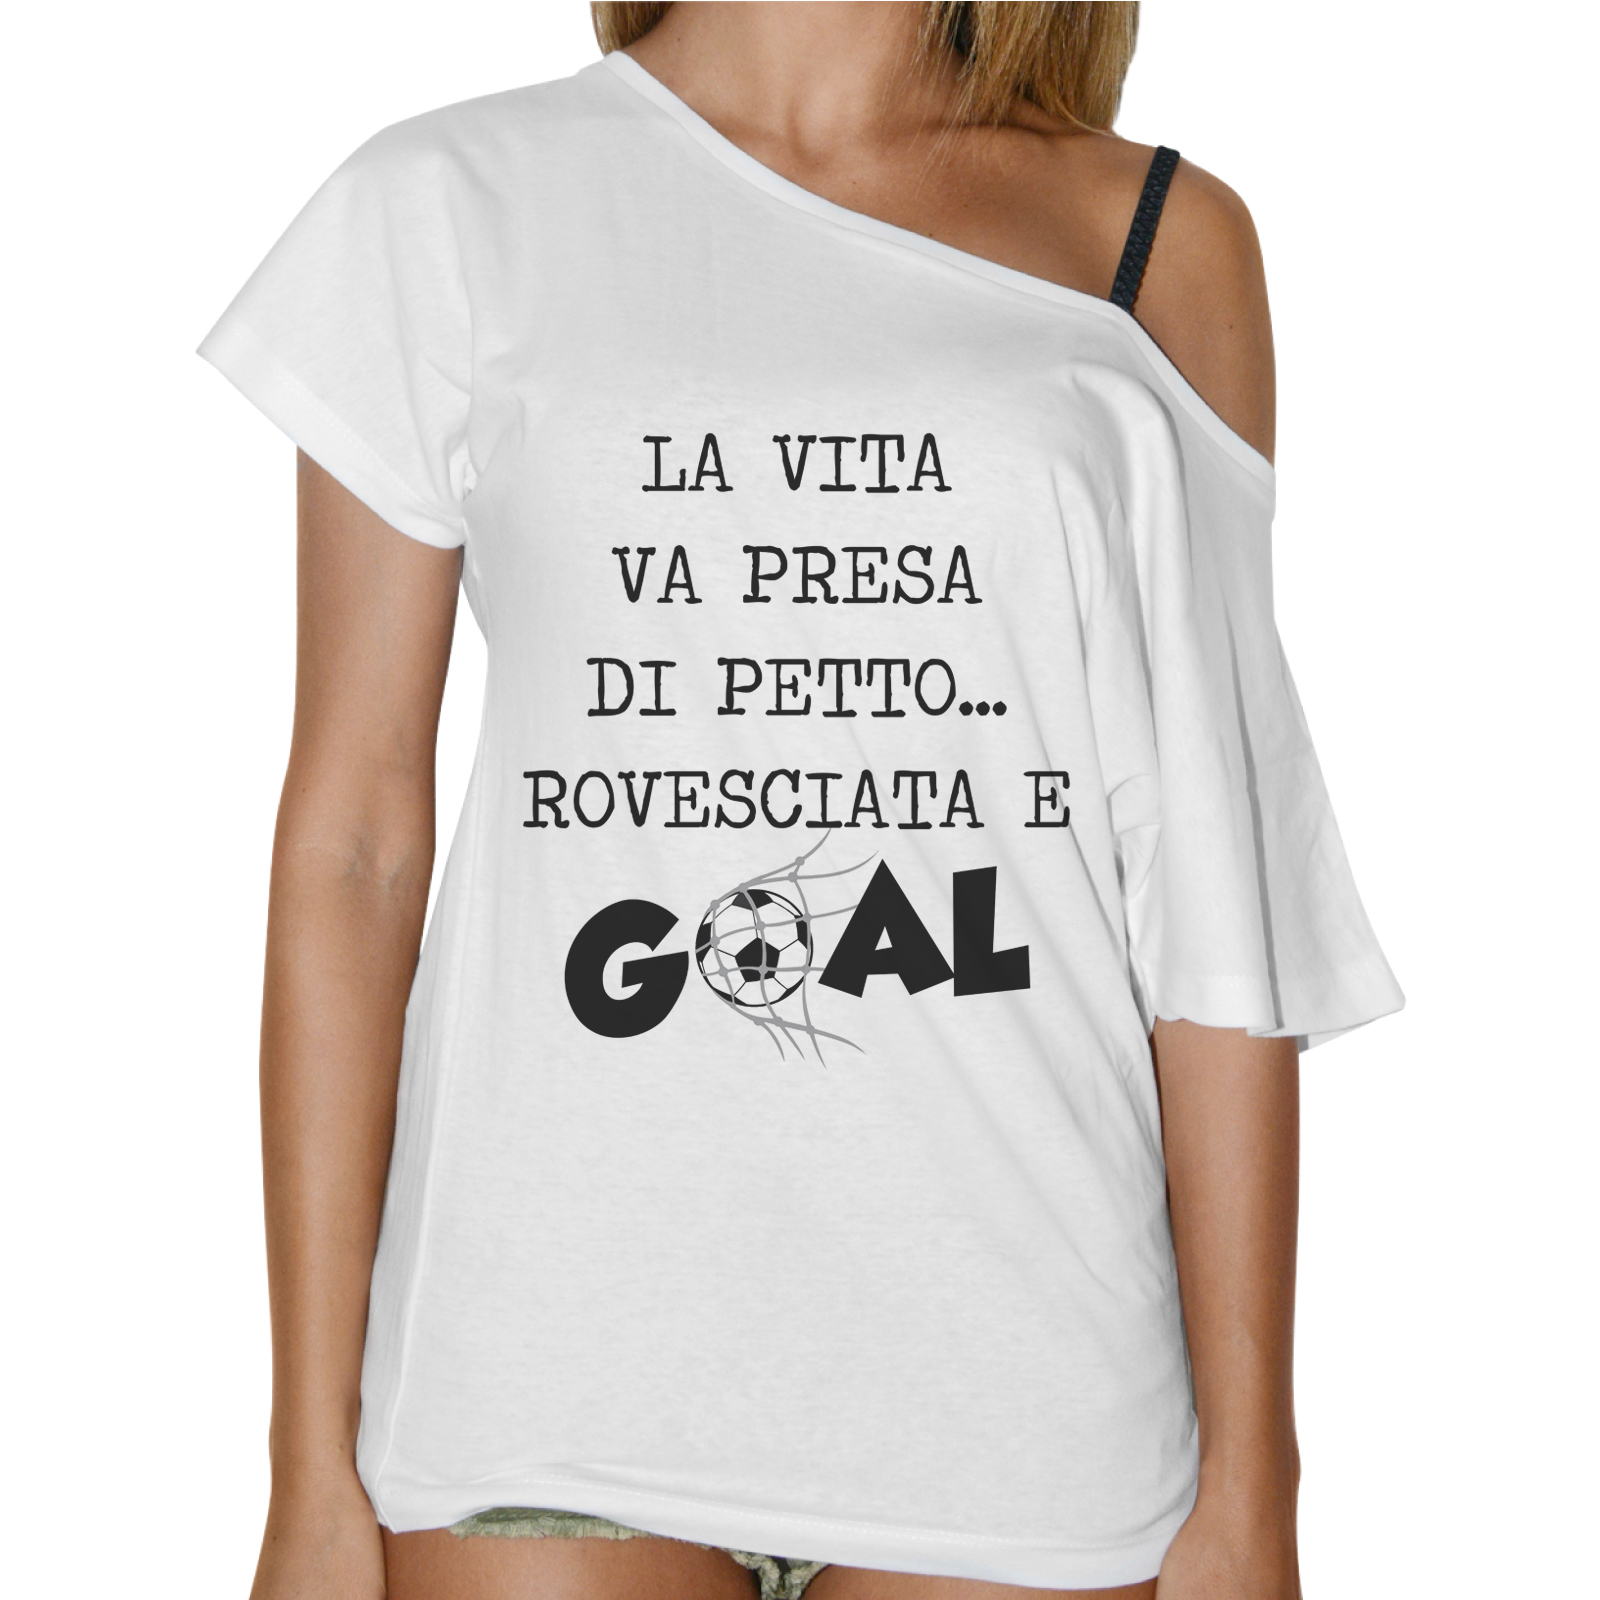 T-Shirt Donna Collo Barca PETTO ROVESCIATA GOAL 1